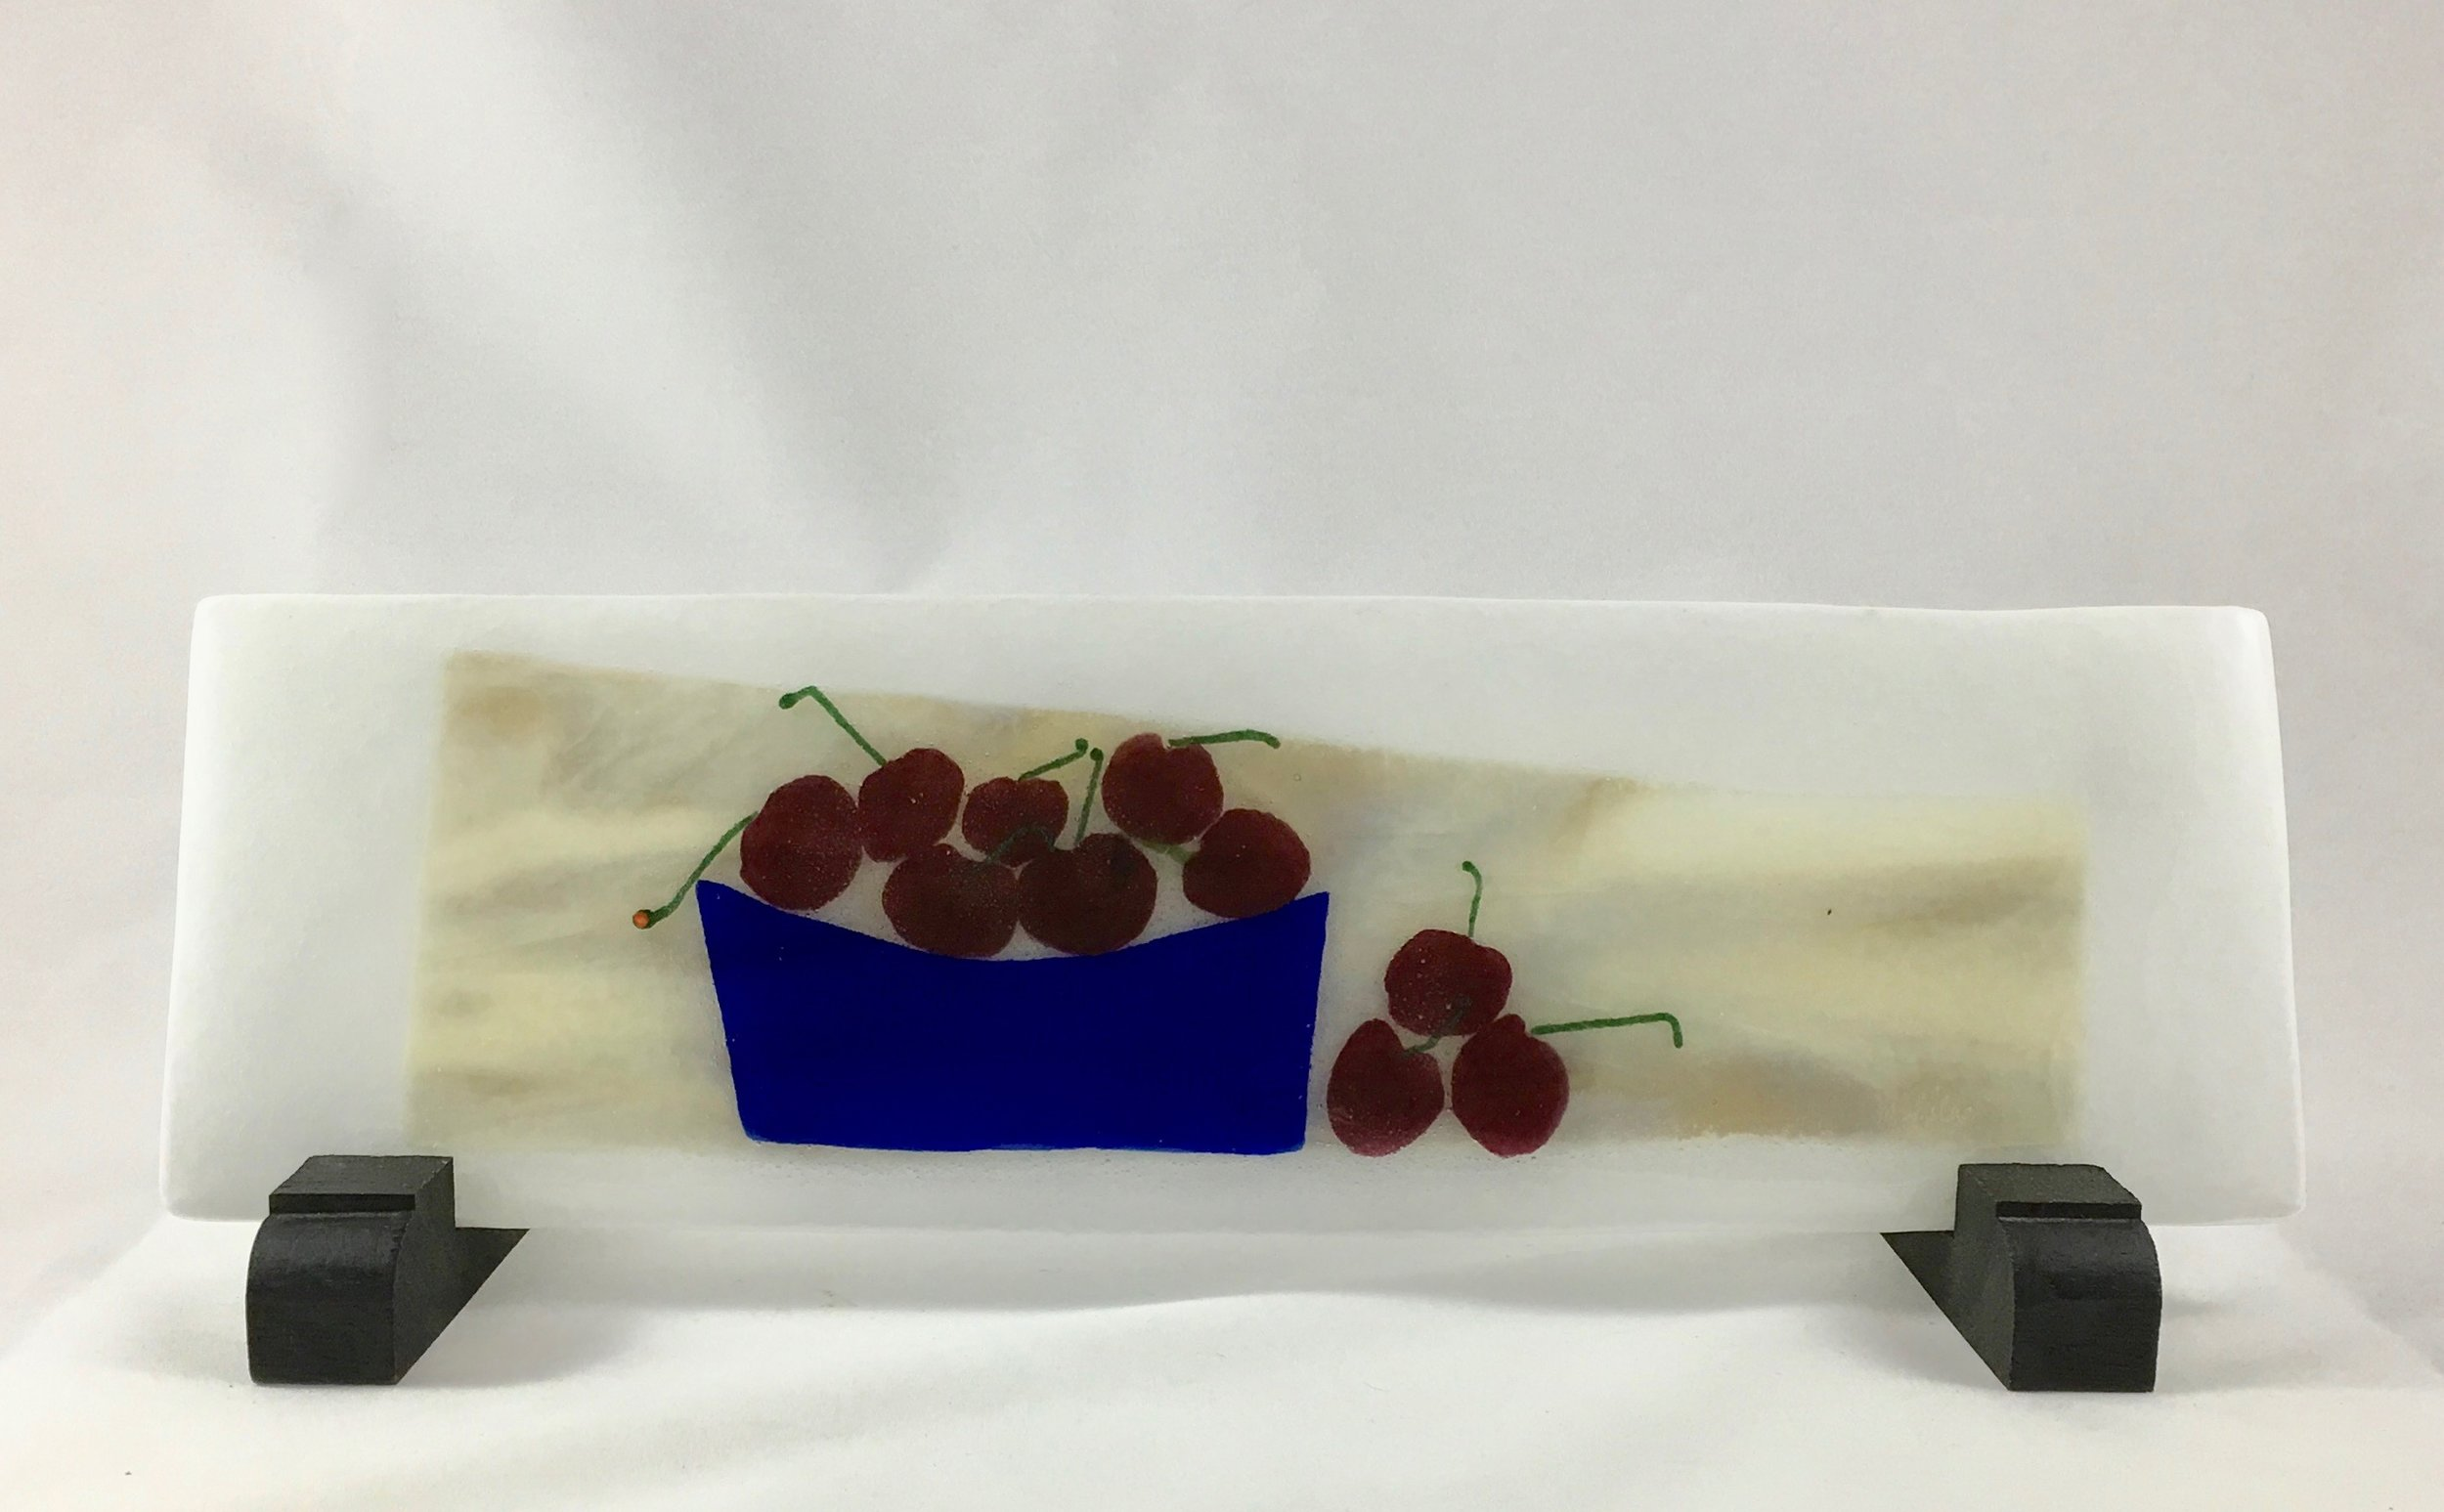 "A Bowl Full of Cherries - 4 3/8"" x 13 7/8"""